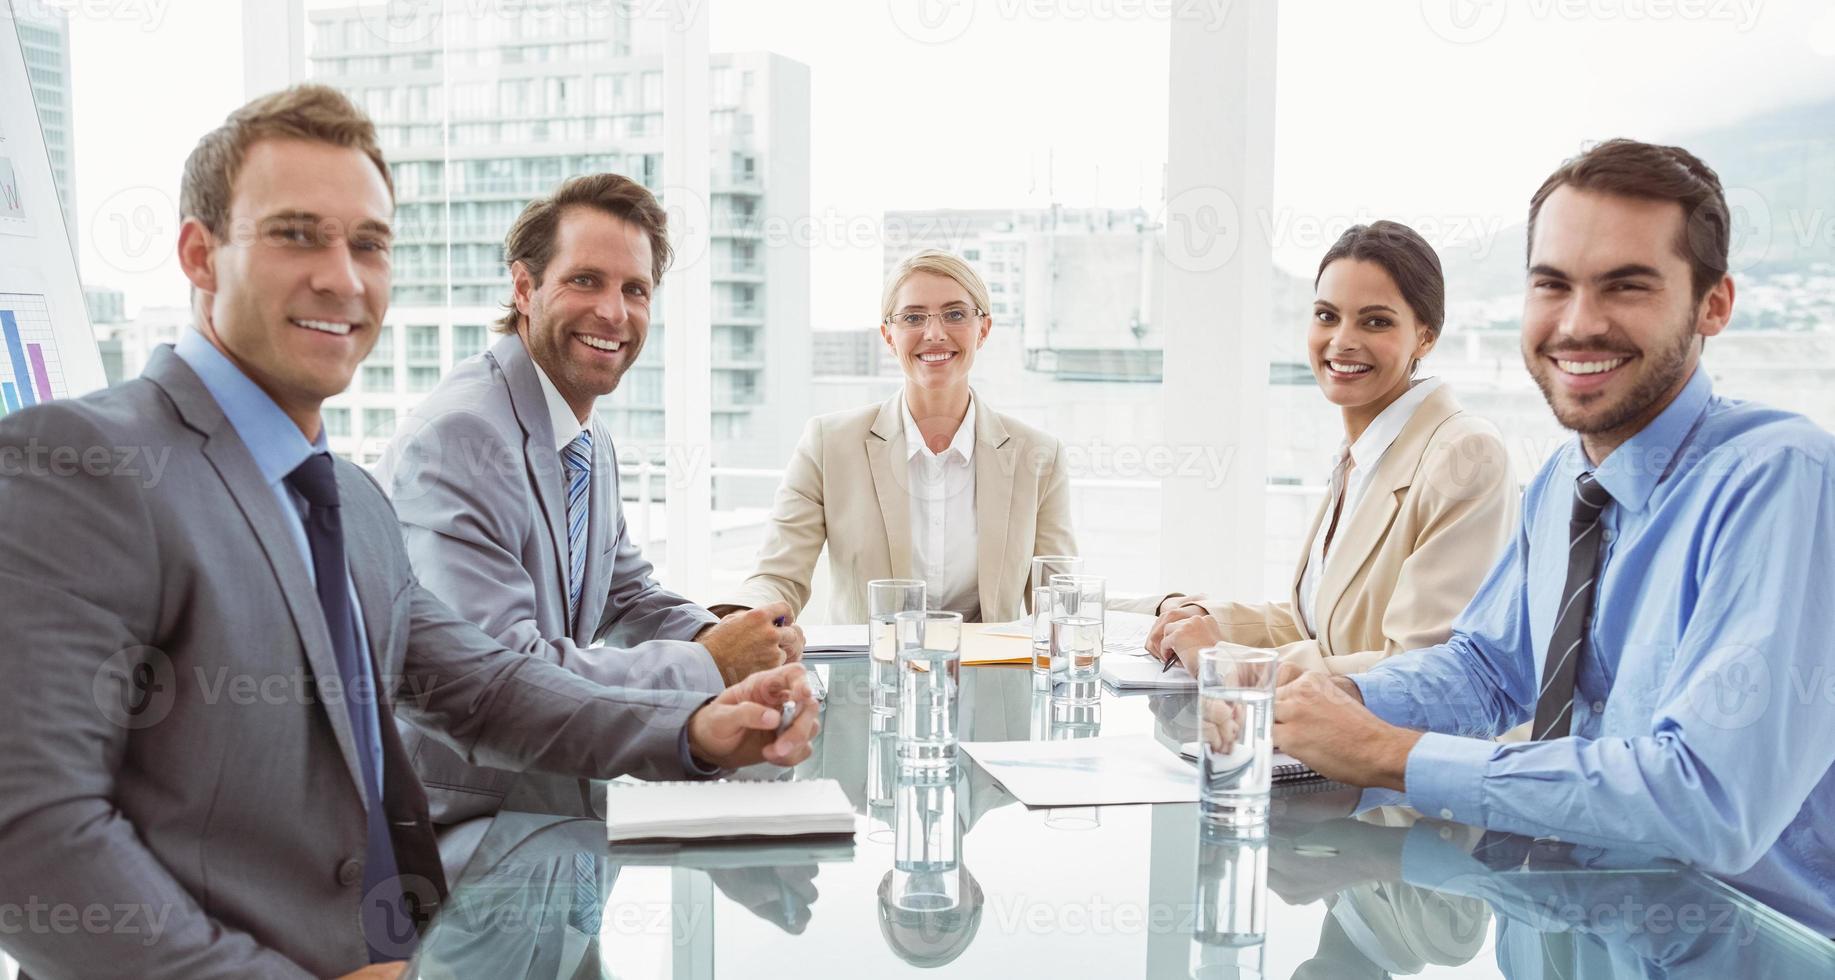 Business people in board room meeting photo